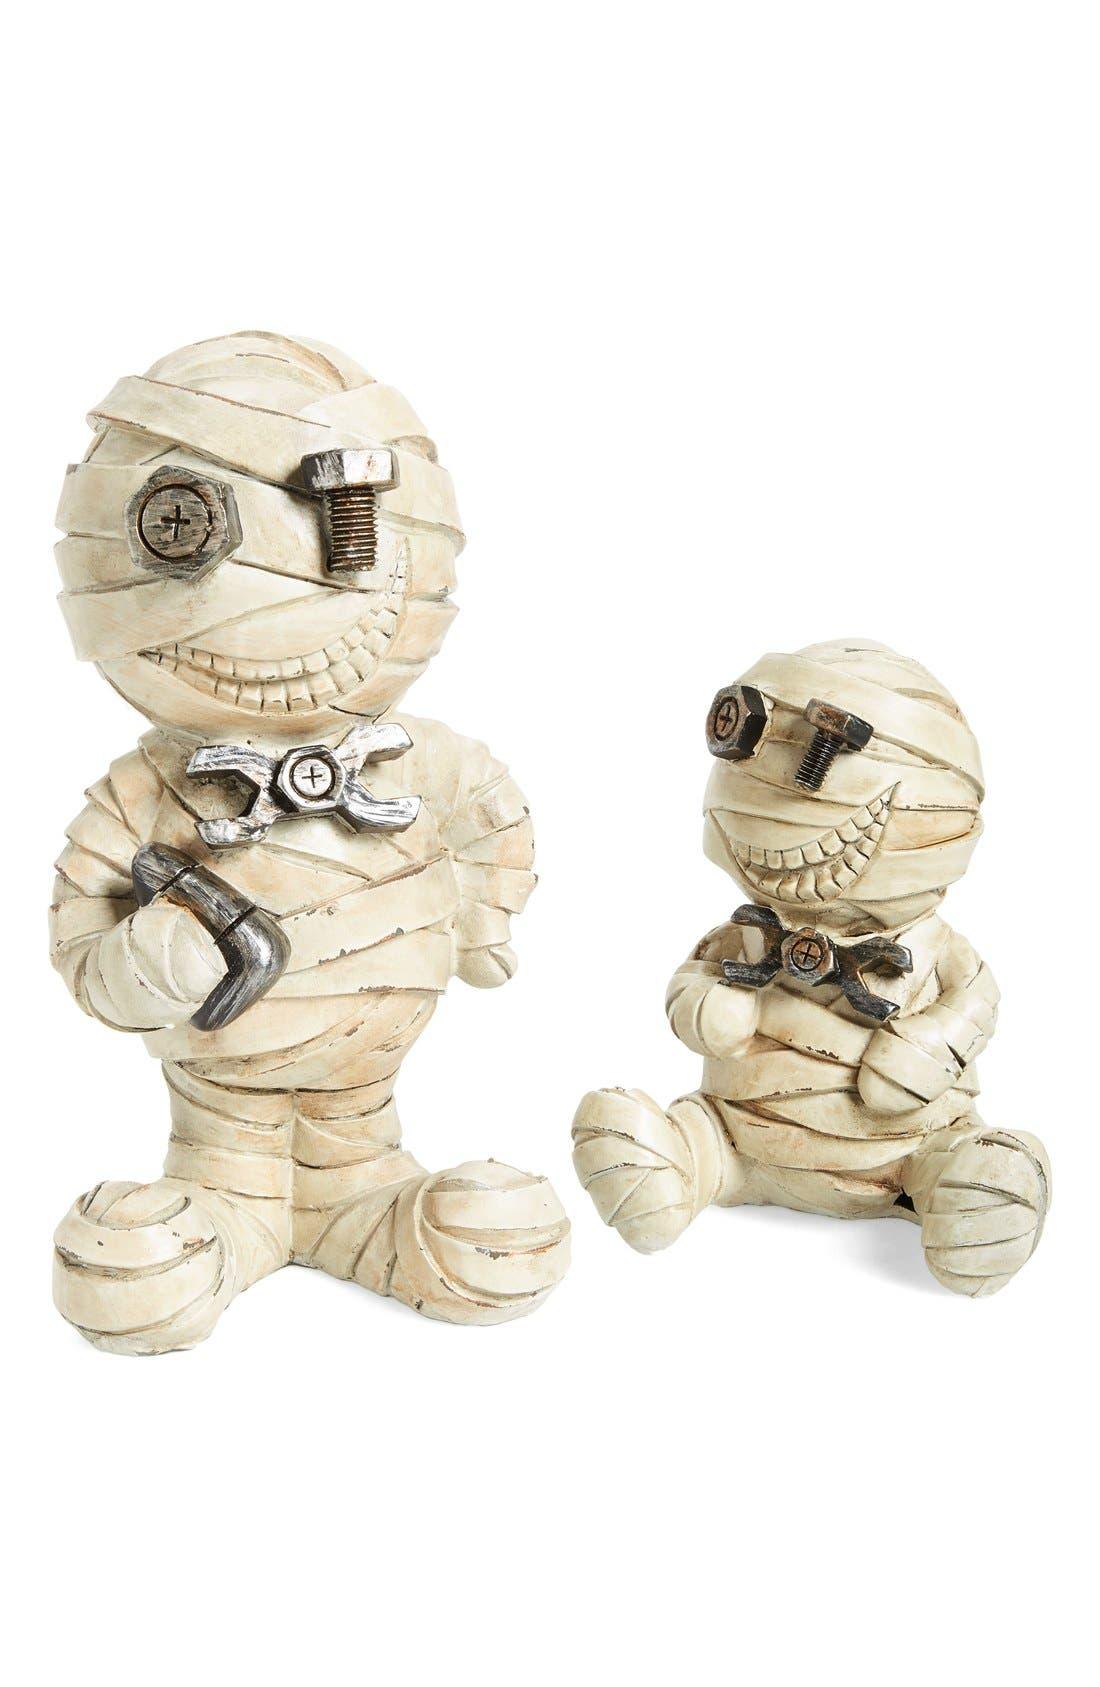 Fantastic Craft 'Steampunk Mummy' Figurine